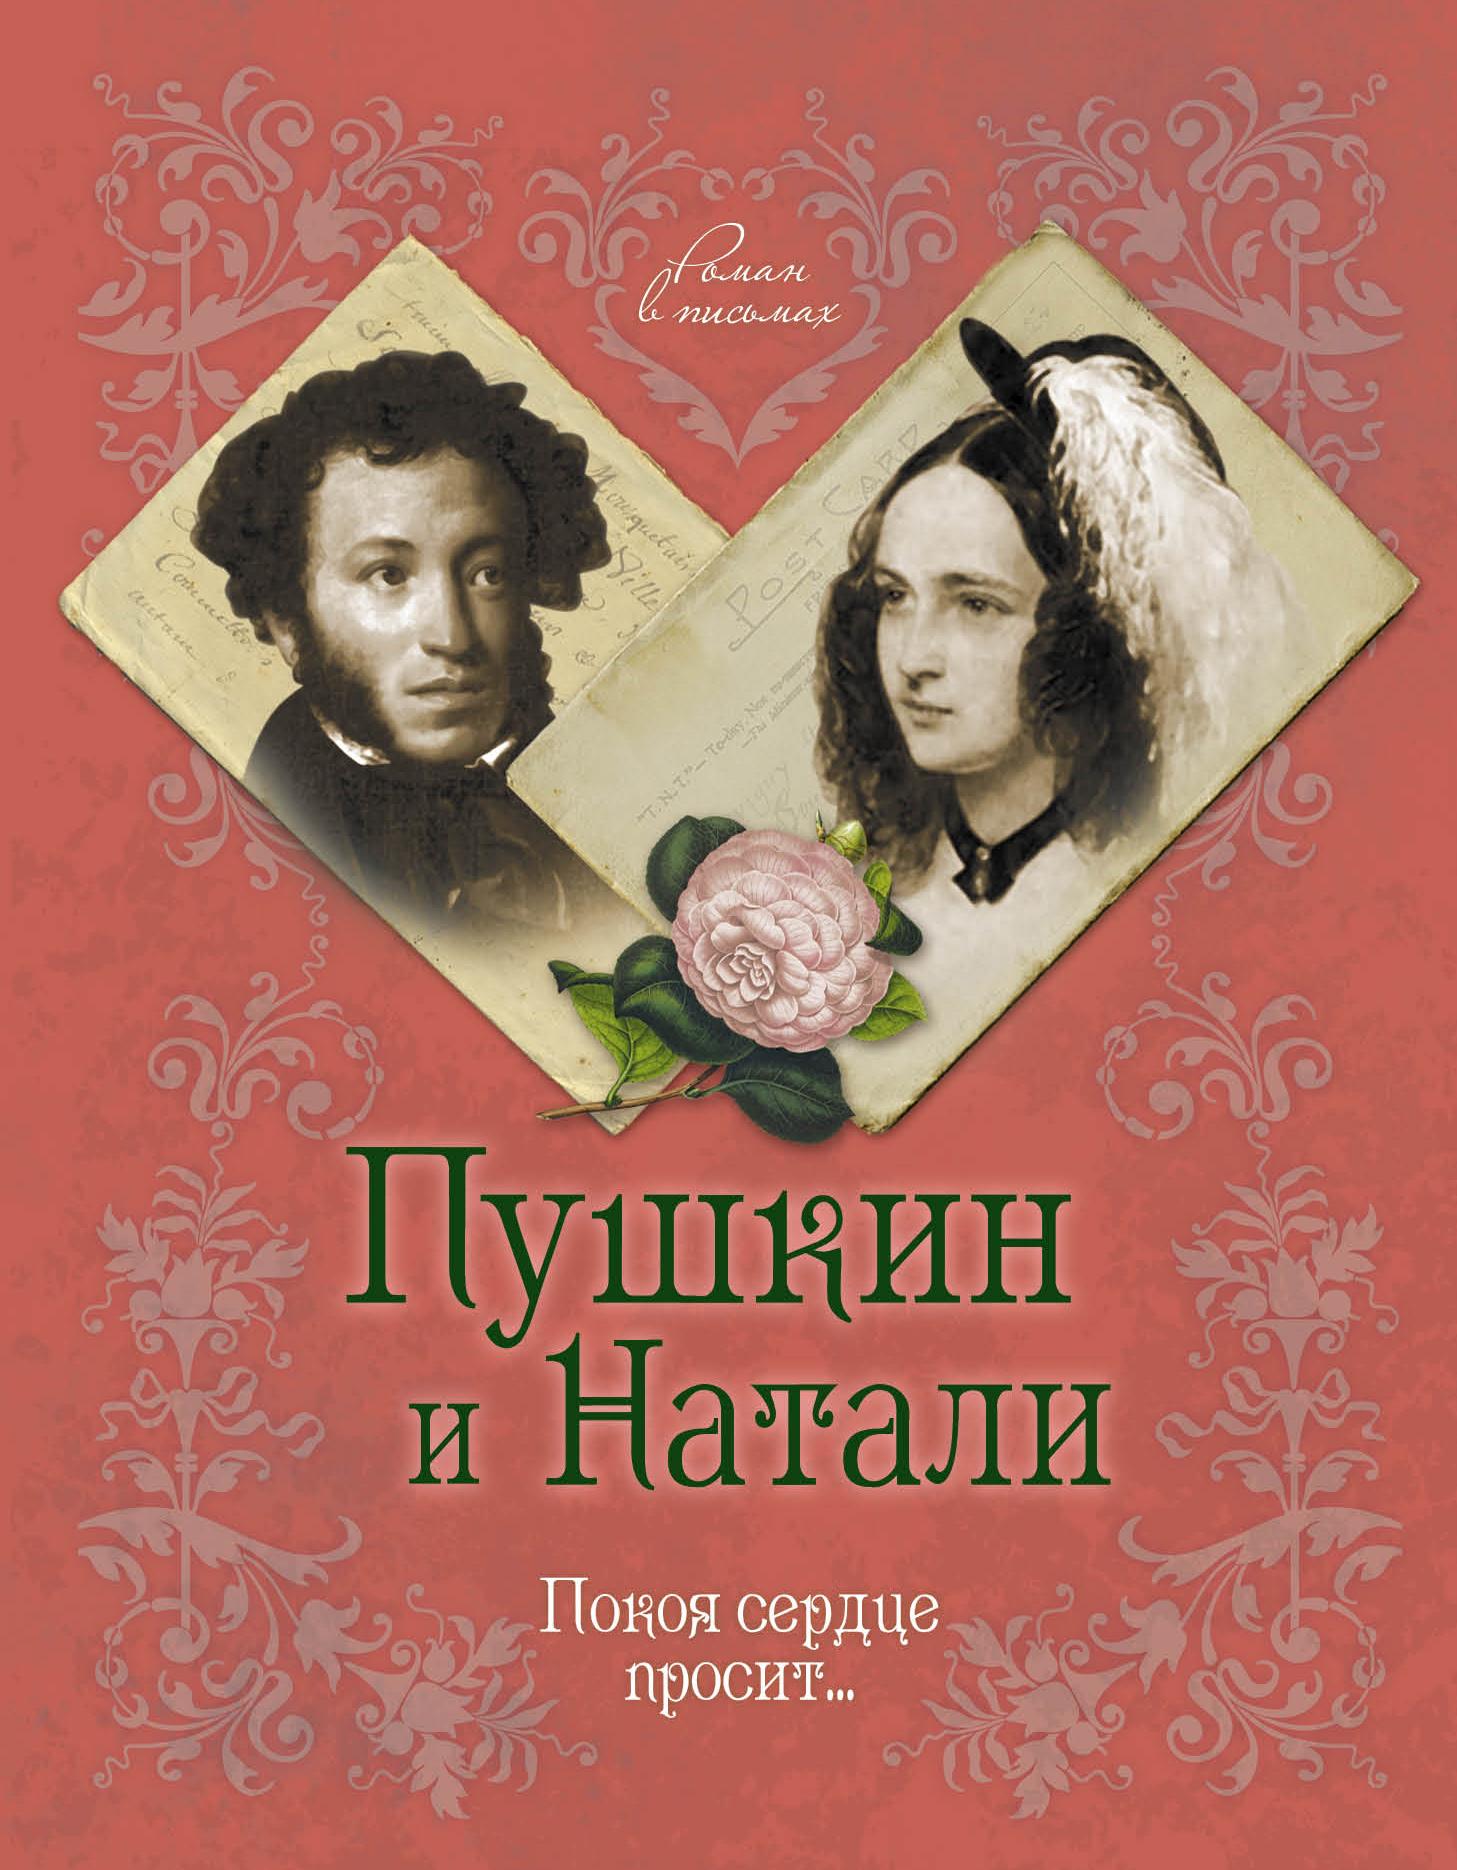 Пушкин и Натали. Покоя сердце просит…